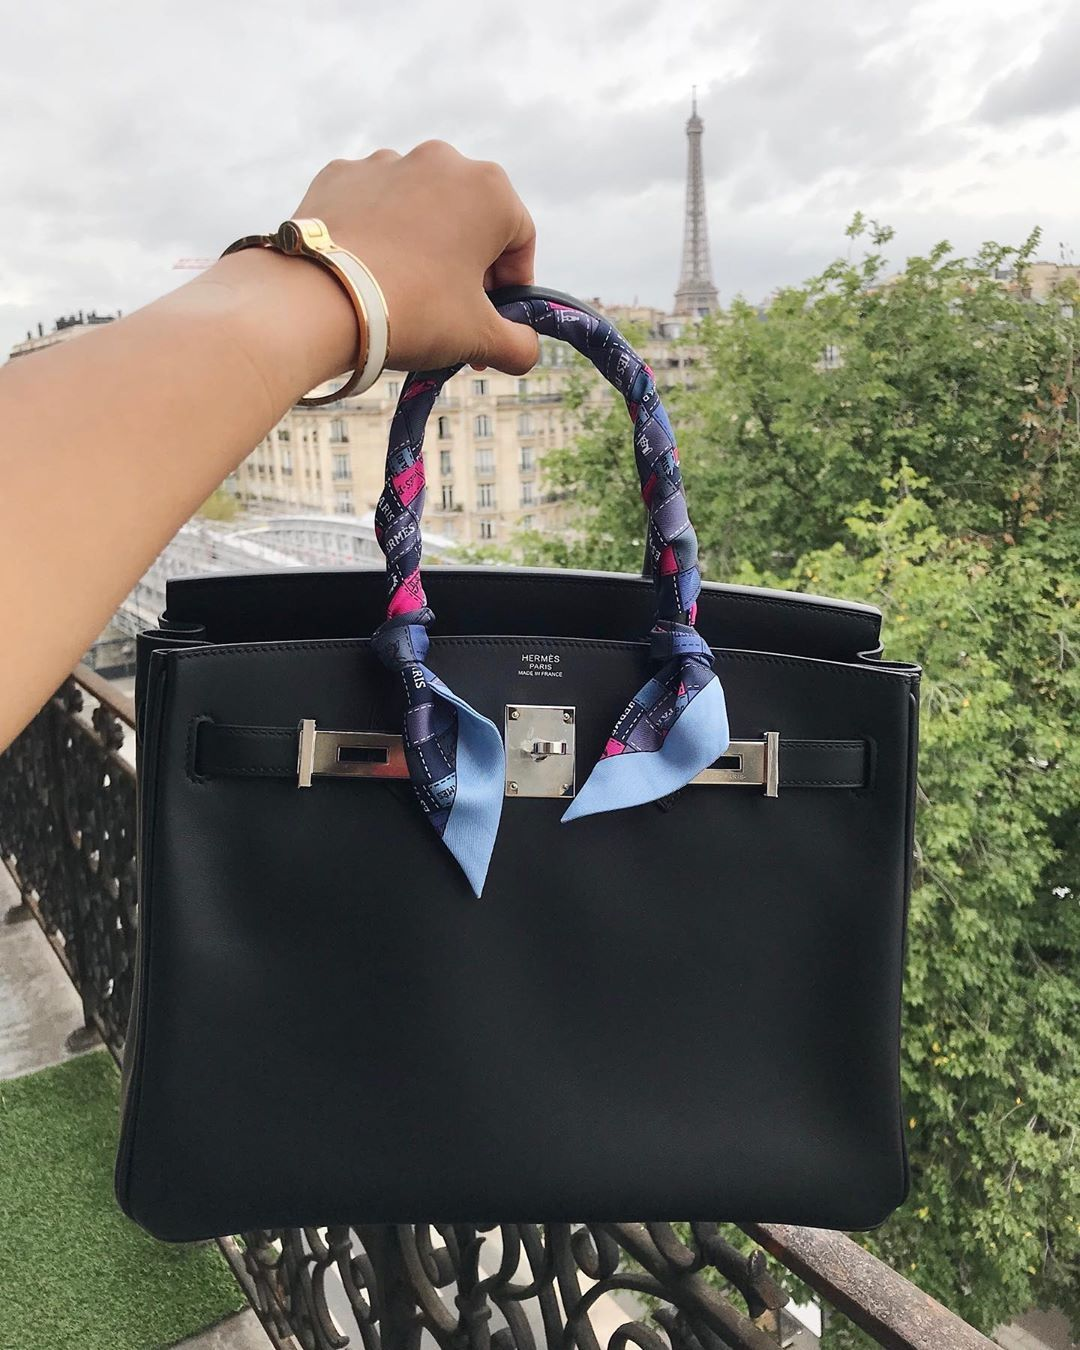 high quality replica handbags, louis vuitton replica, chanel replica, dior replica, hermes bag replica, replica designer belt The best places to get this Bag🎶👉🏻👉🏻👉🏻☎️WhatsApp: +8618666021721 👈🏻👈🏻 ▪️ 🛩Worldwide Express Shipping🌏 ▪️▪️ #hermes#hermesbirkin#hermesbirkin30#hermesveaujonathan#paris#bagsoftpf#boptalk#pursebop#bagsofinstagram#hermesaddict#eiffeltower#bagoftheday#fashionblogger#fblogger#fashiongram#aussiefashionblogger #chanelcase #guccilovers #yslclutch